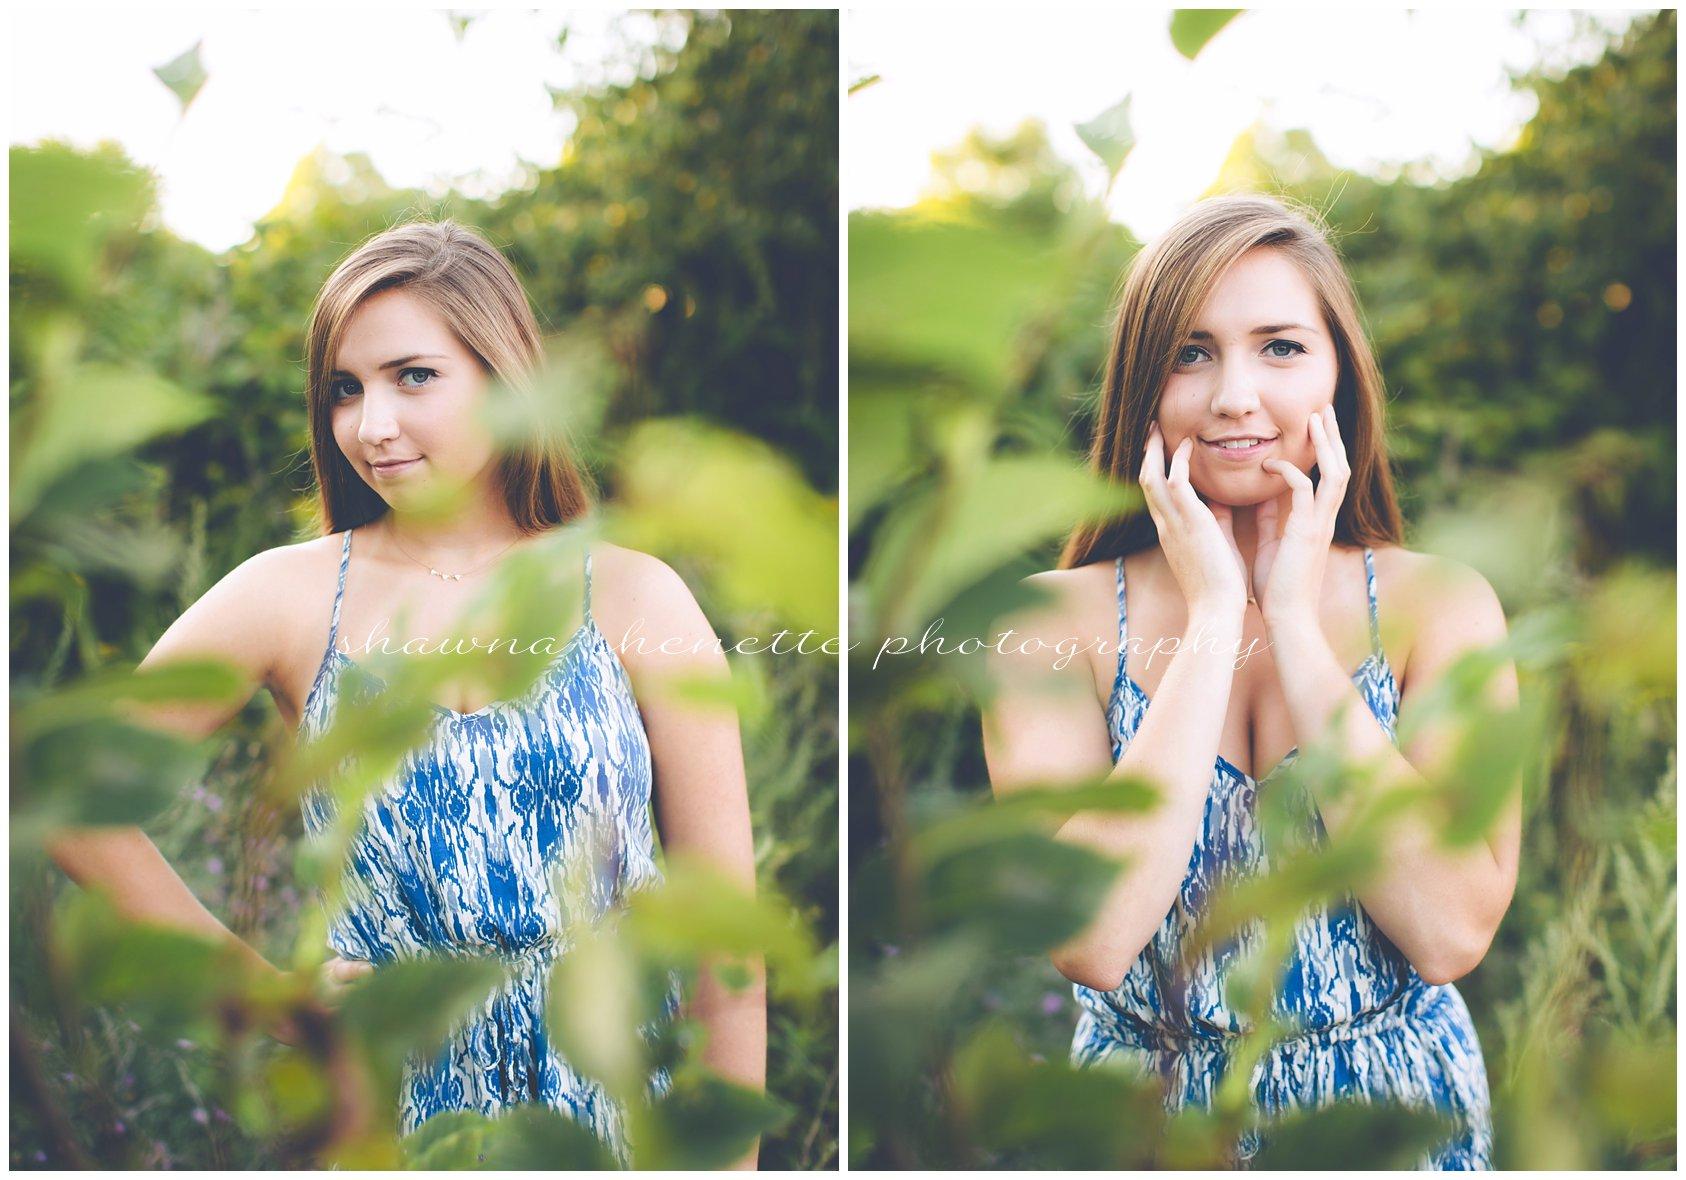 Millbury MA Senior Portrait Photographer Worcester High School Senior Photos Central MA Marlborough Sutton Auburn Grafton